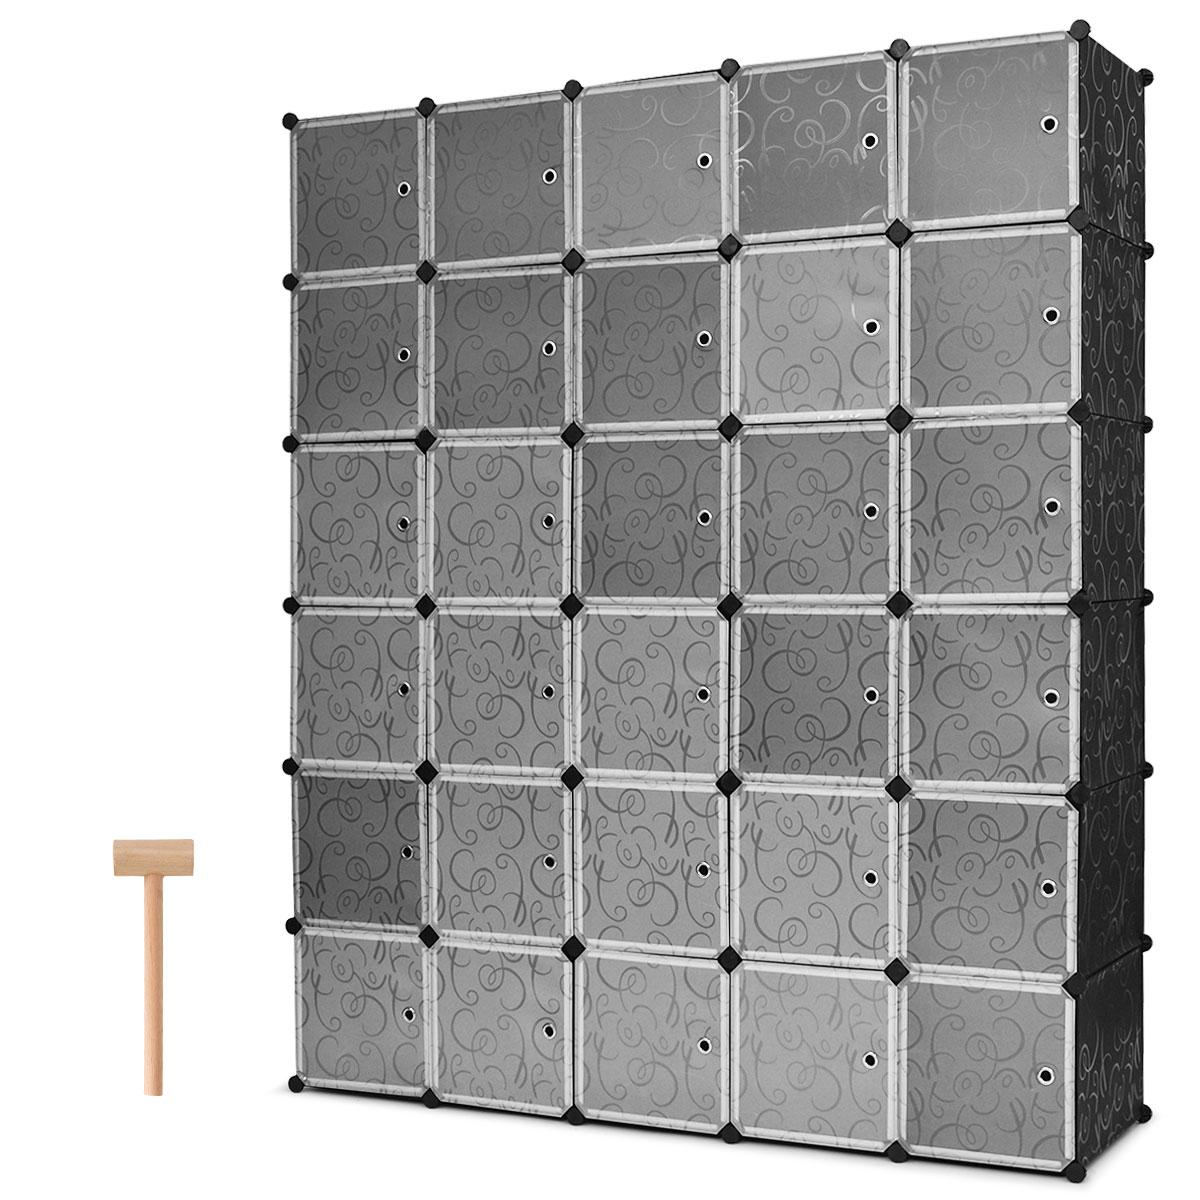 Costway DIY 30 Cube Portable font b Closet b font Storage Organizer Clothes Wardrobe Cabinet W